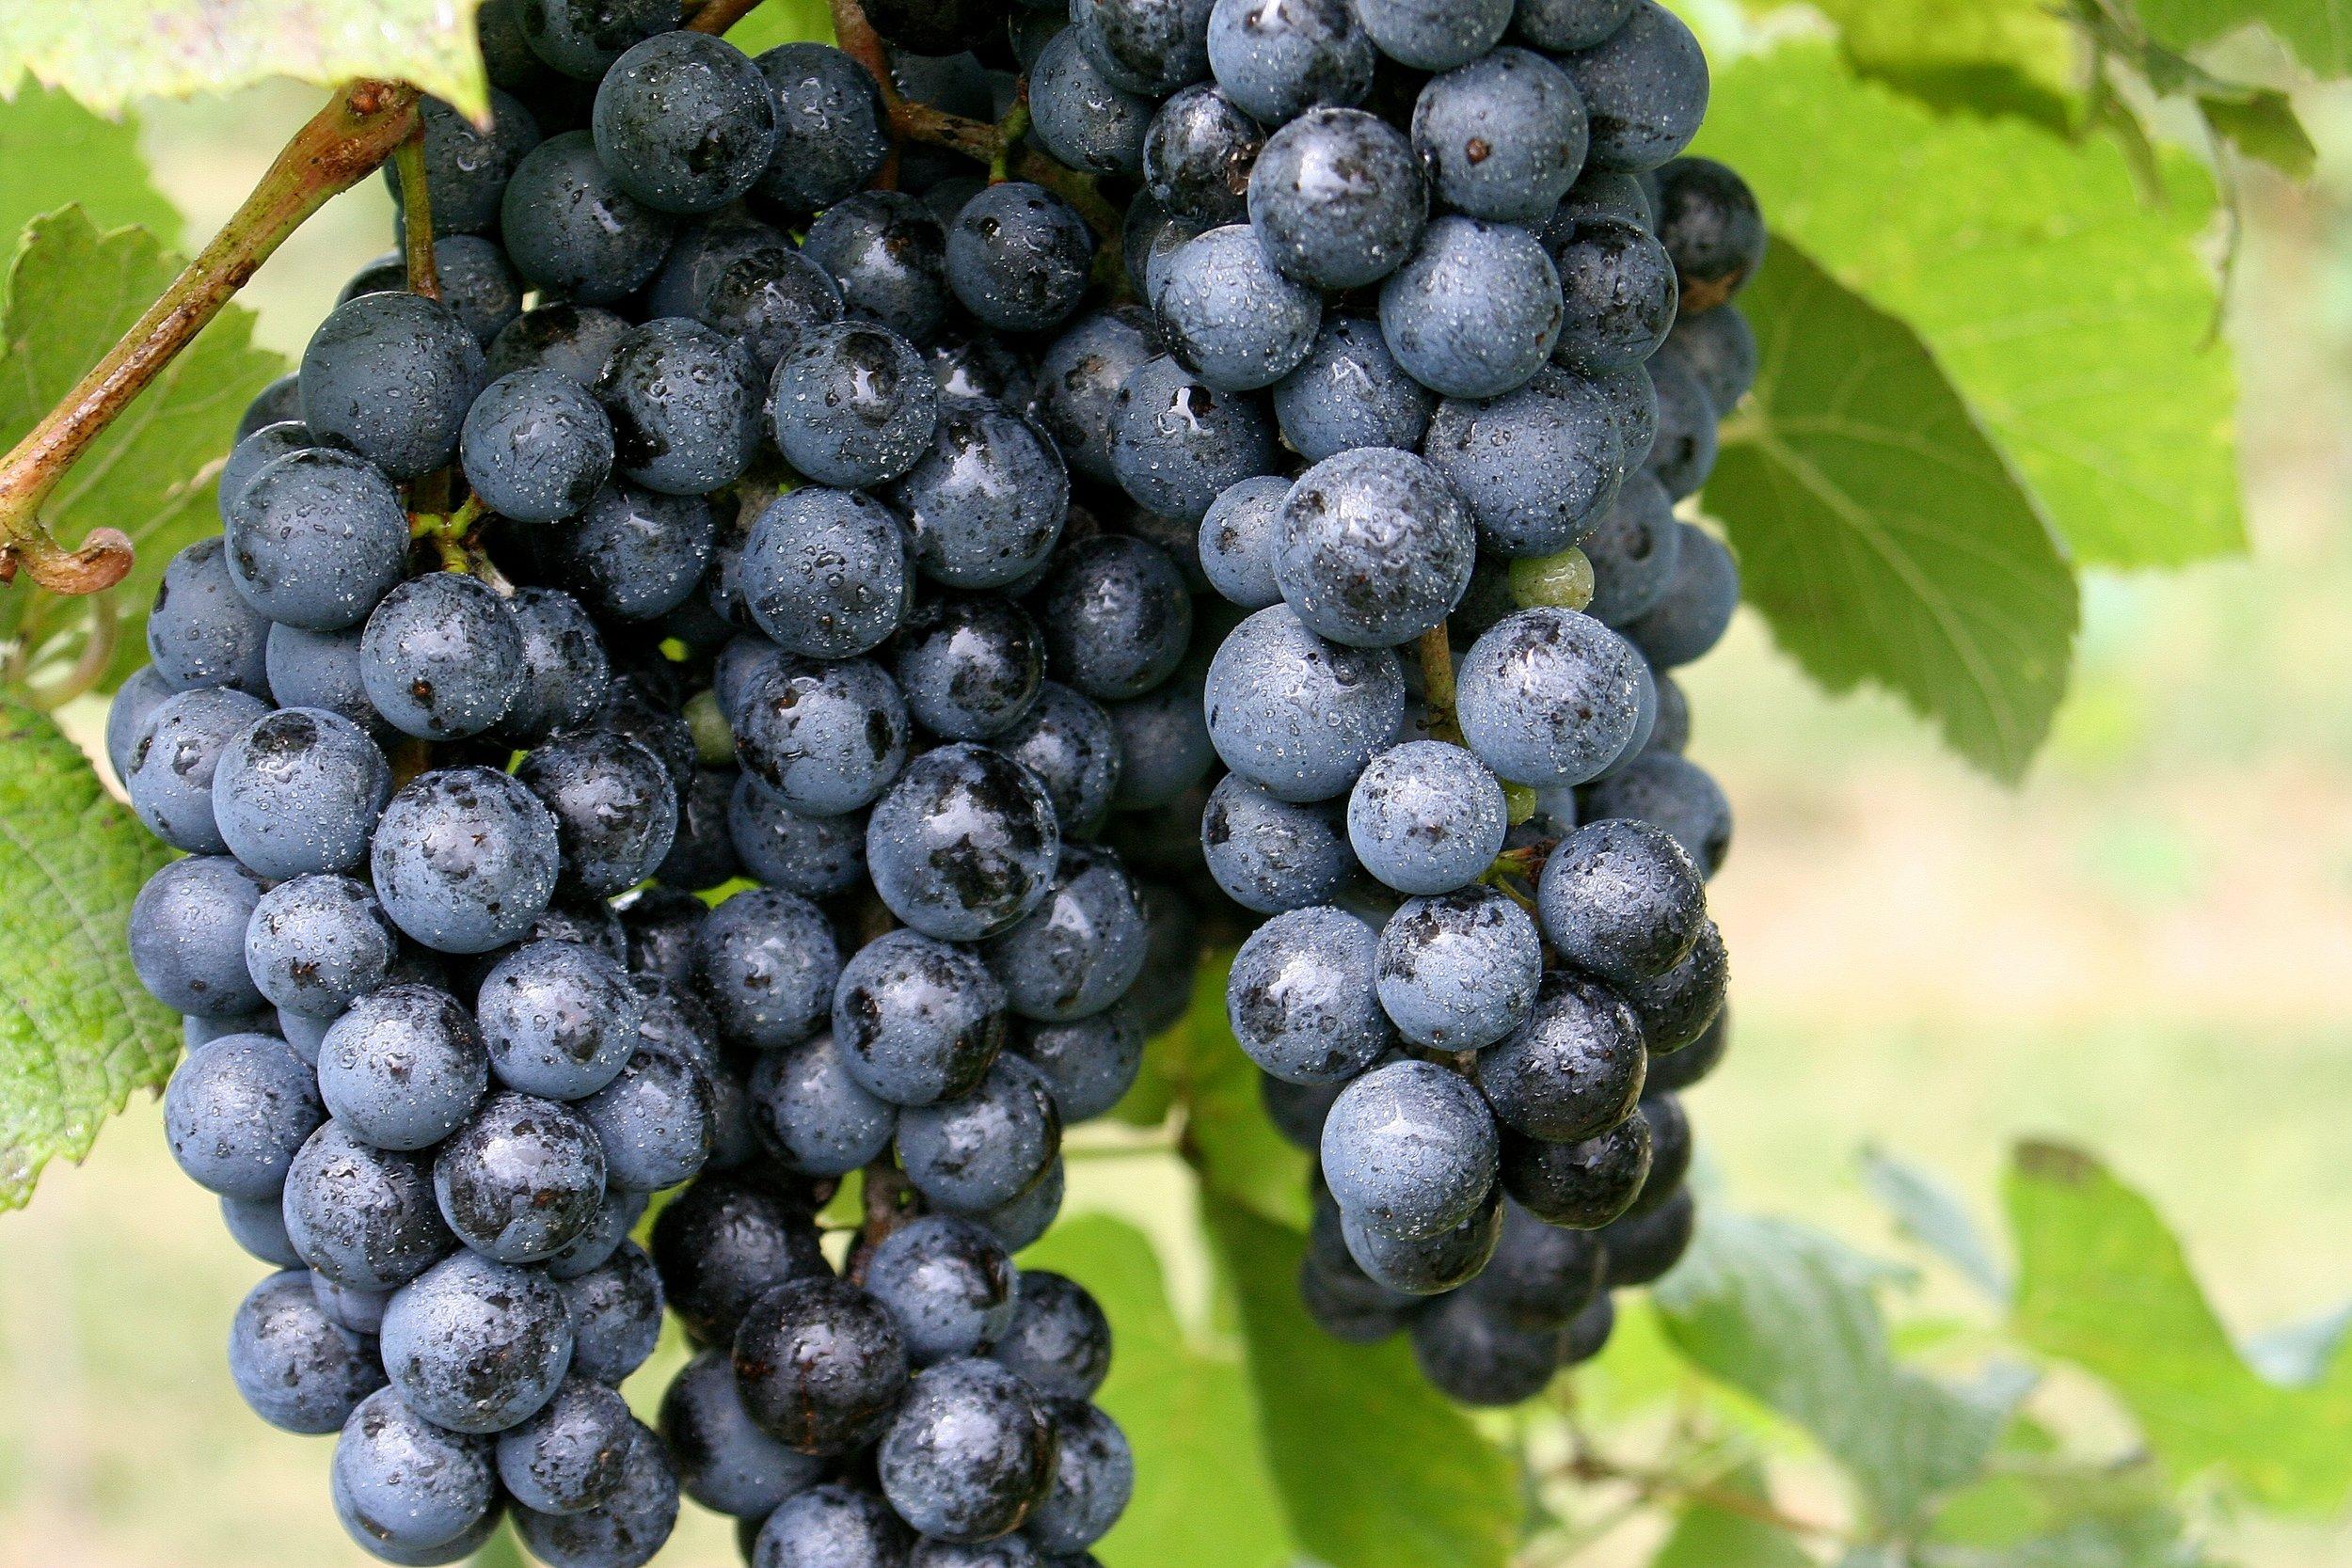 Two_Saints_Winery_large purple grapes 1.jpg